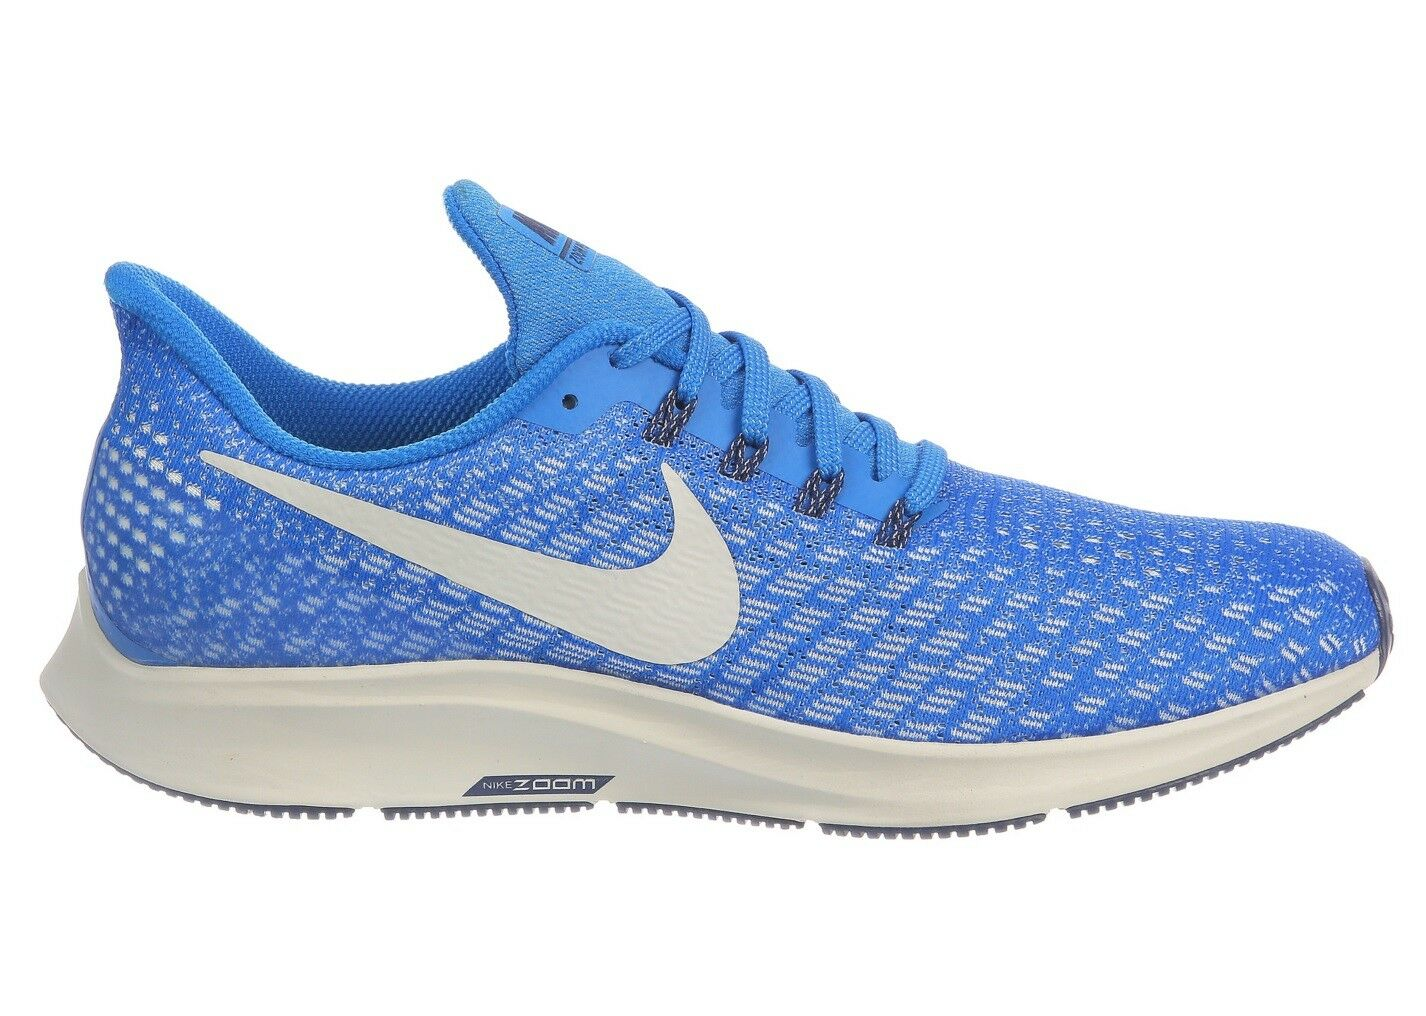 Nike uomini air zoom pegasus 35 uomini Nike 942851-402 cobalto blaze scarpe taglia 14 2d3bc5